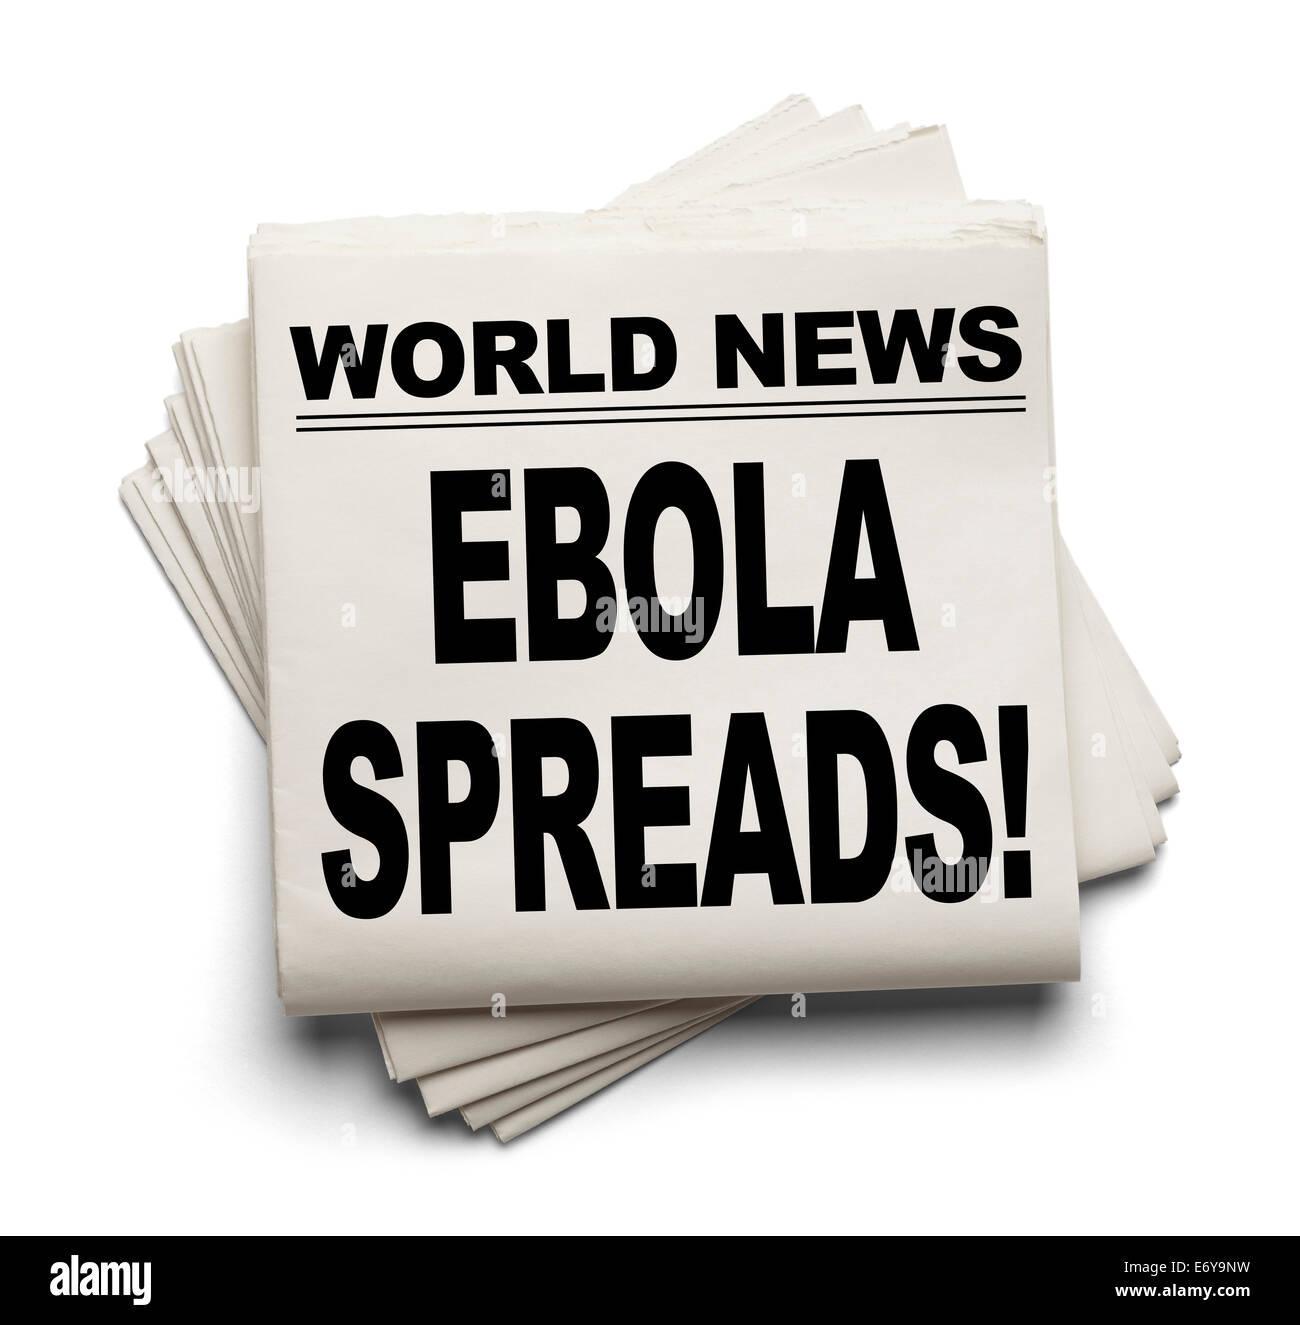 World News Paper Headline Ebola Spreads Isolated on White Background. - Stock Image